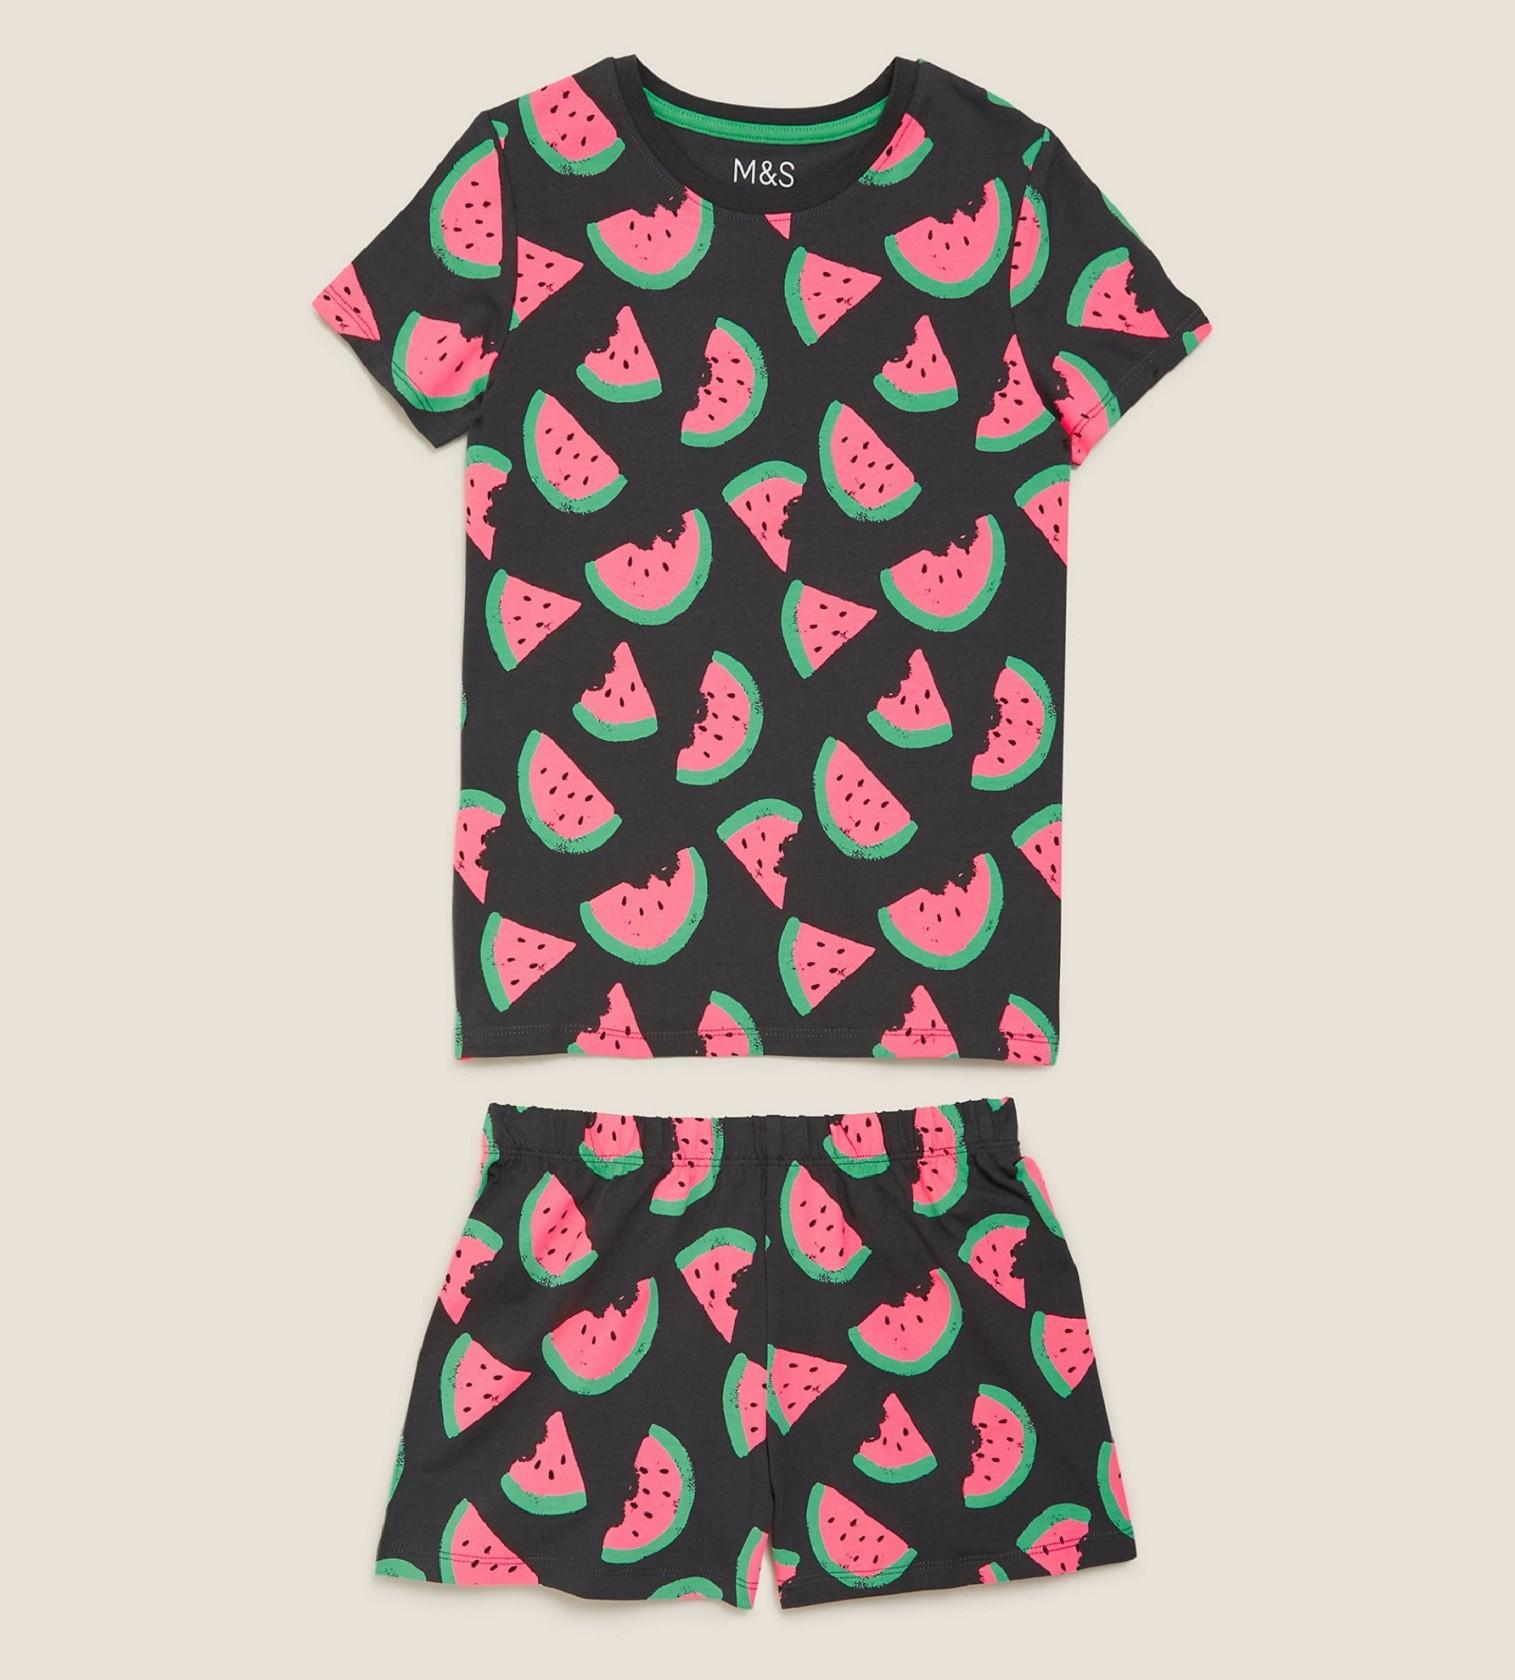 Купити Піжама M&S Cotton Watermelon - фото 1